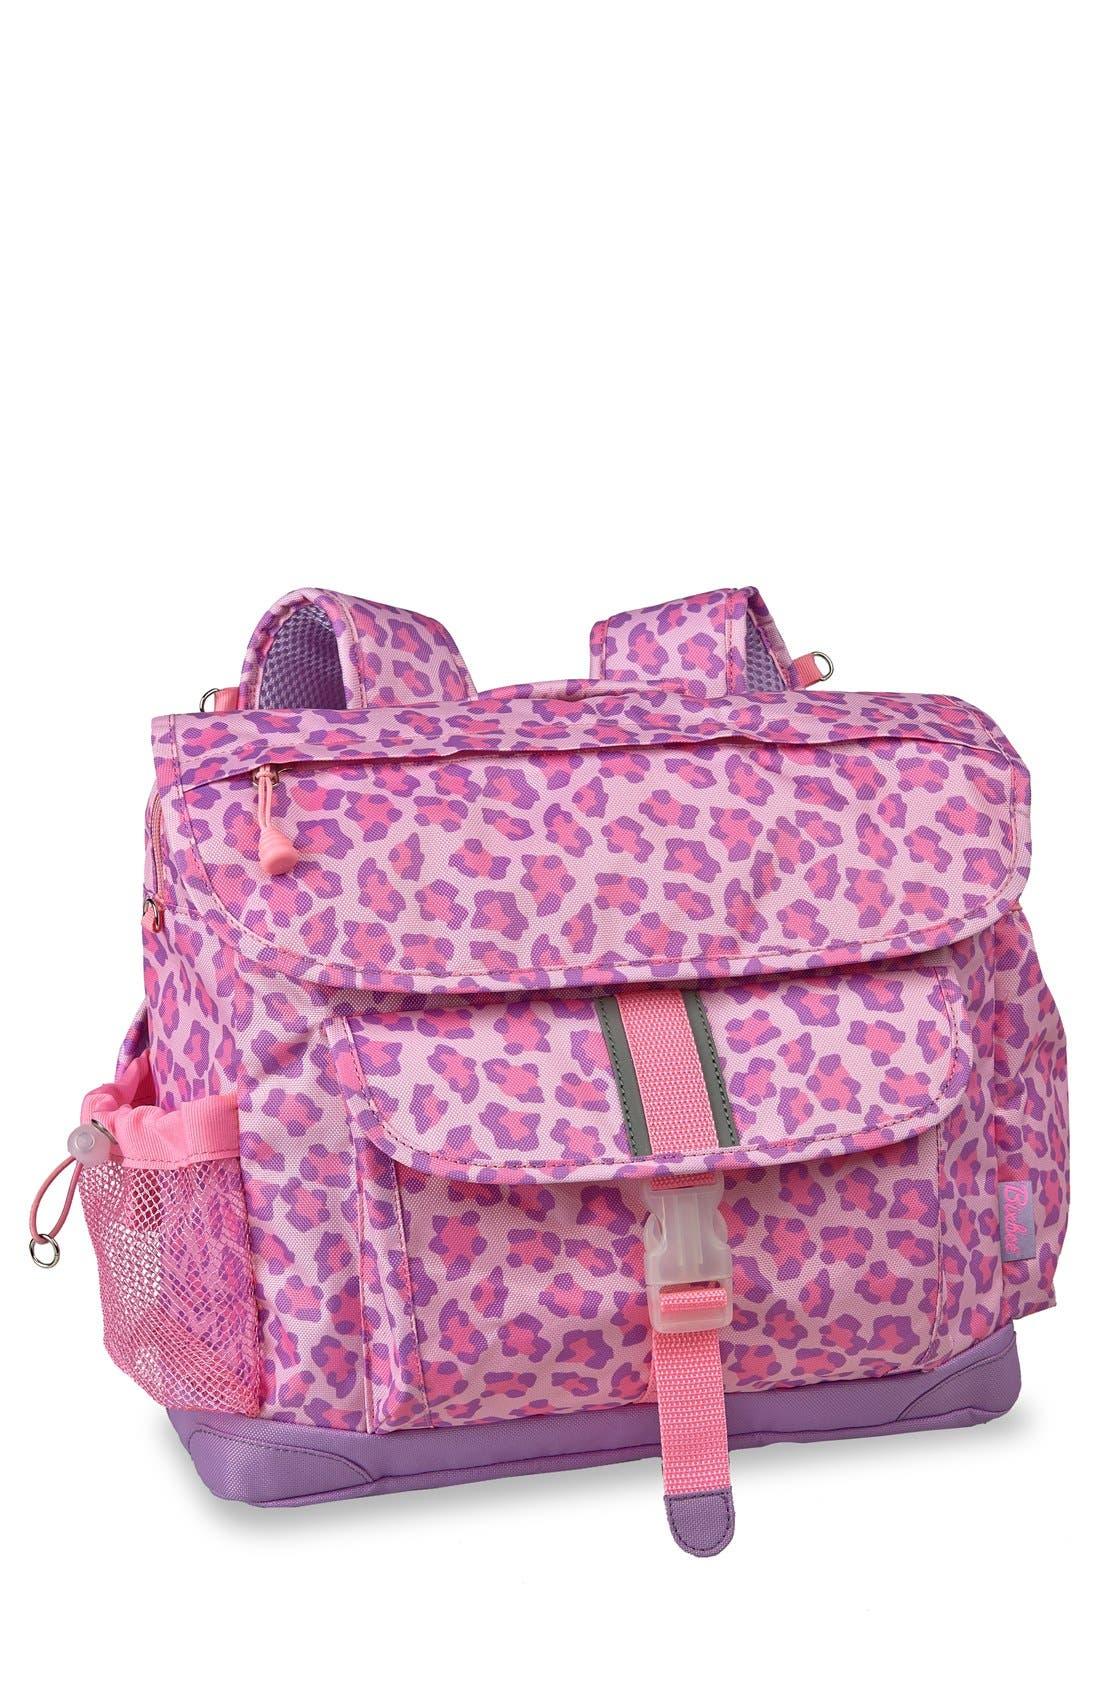 Main Image - Bixbee 'Large Sassy Spots' Leopard Print Backpack (Kids)